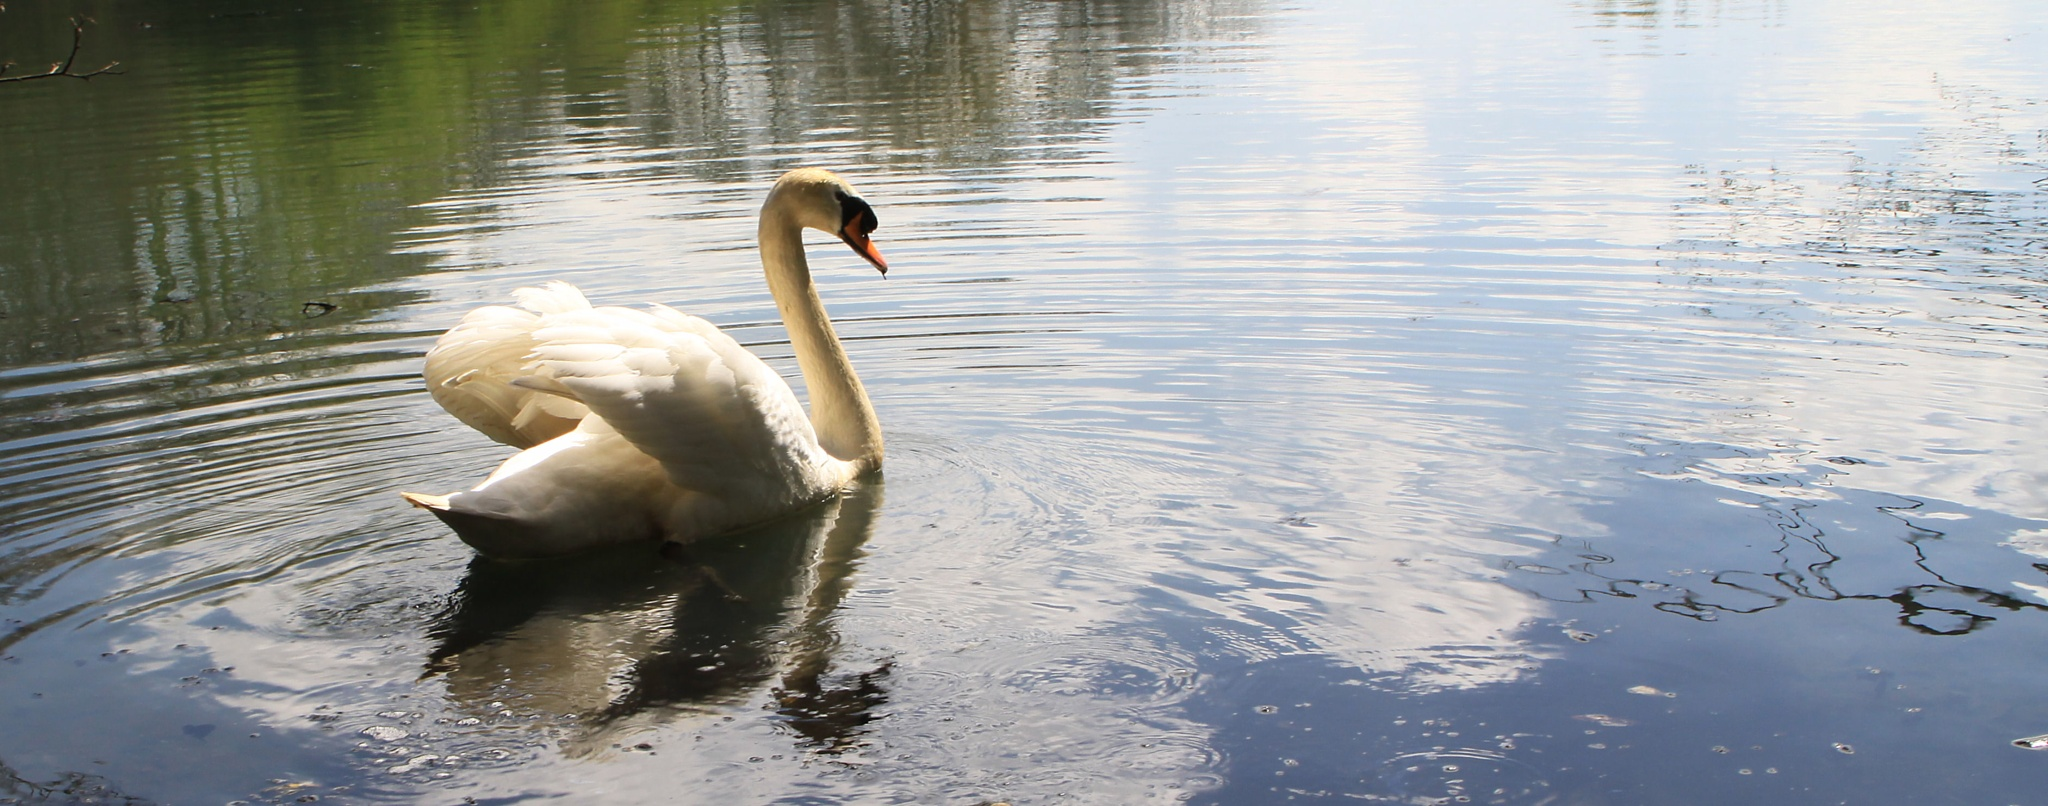 Swan Lake by Sarah Walters